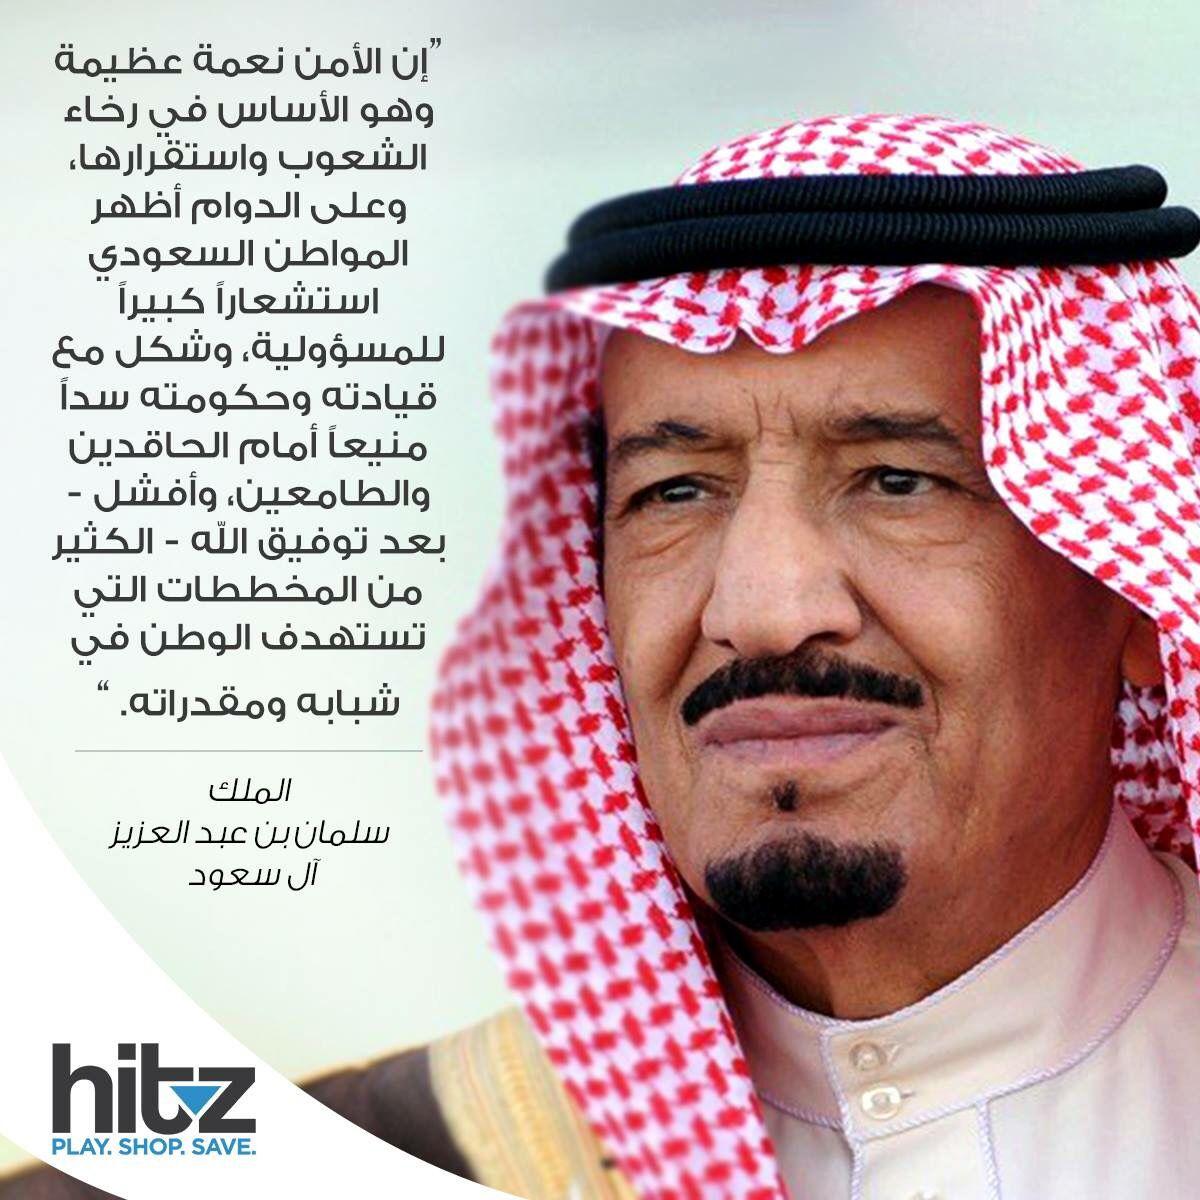 أشهر مقولات محمد بن سلمان